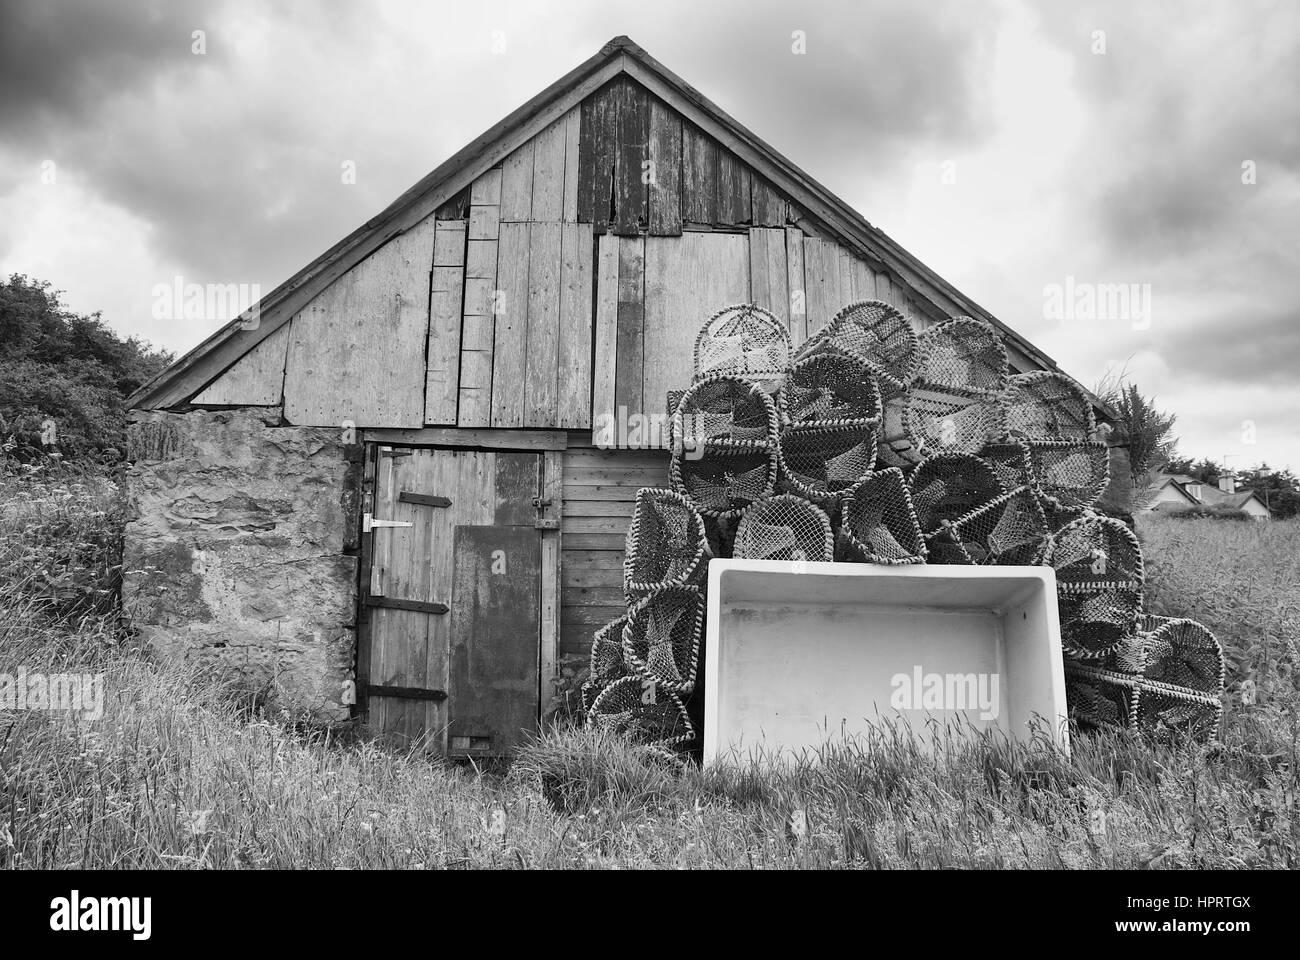 Fishermans building/equipment on Isle of Skye, Scotland - Stock Image